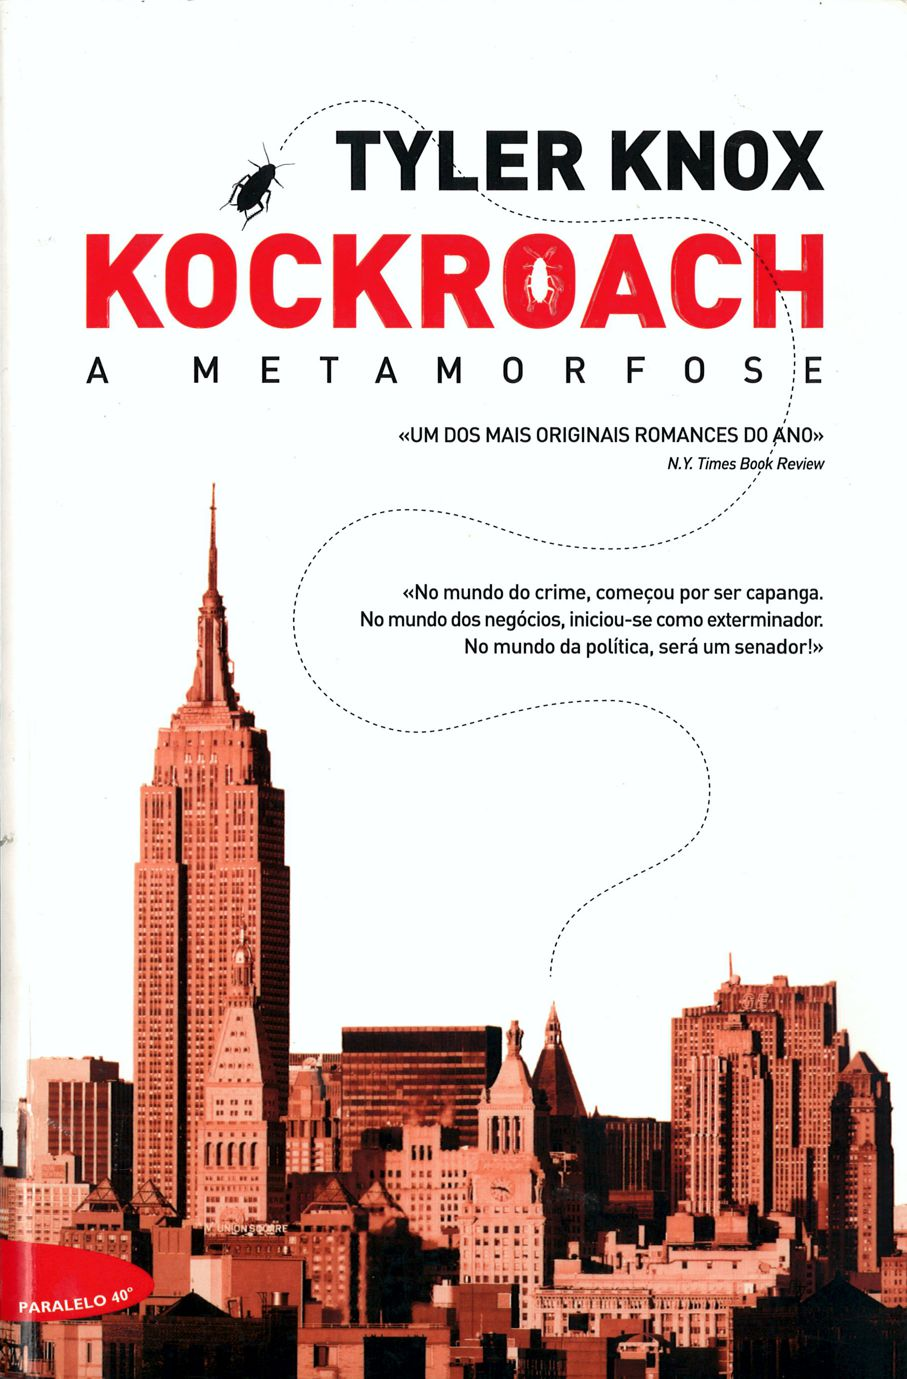 Kockroach A Metamorfose